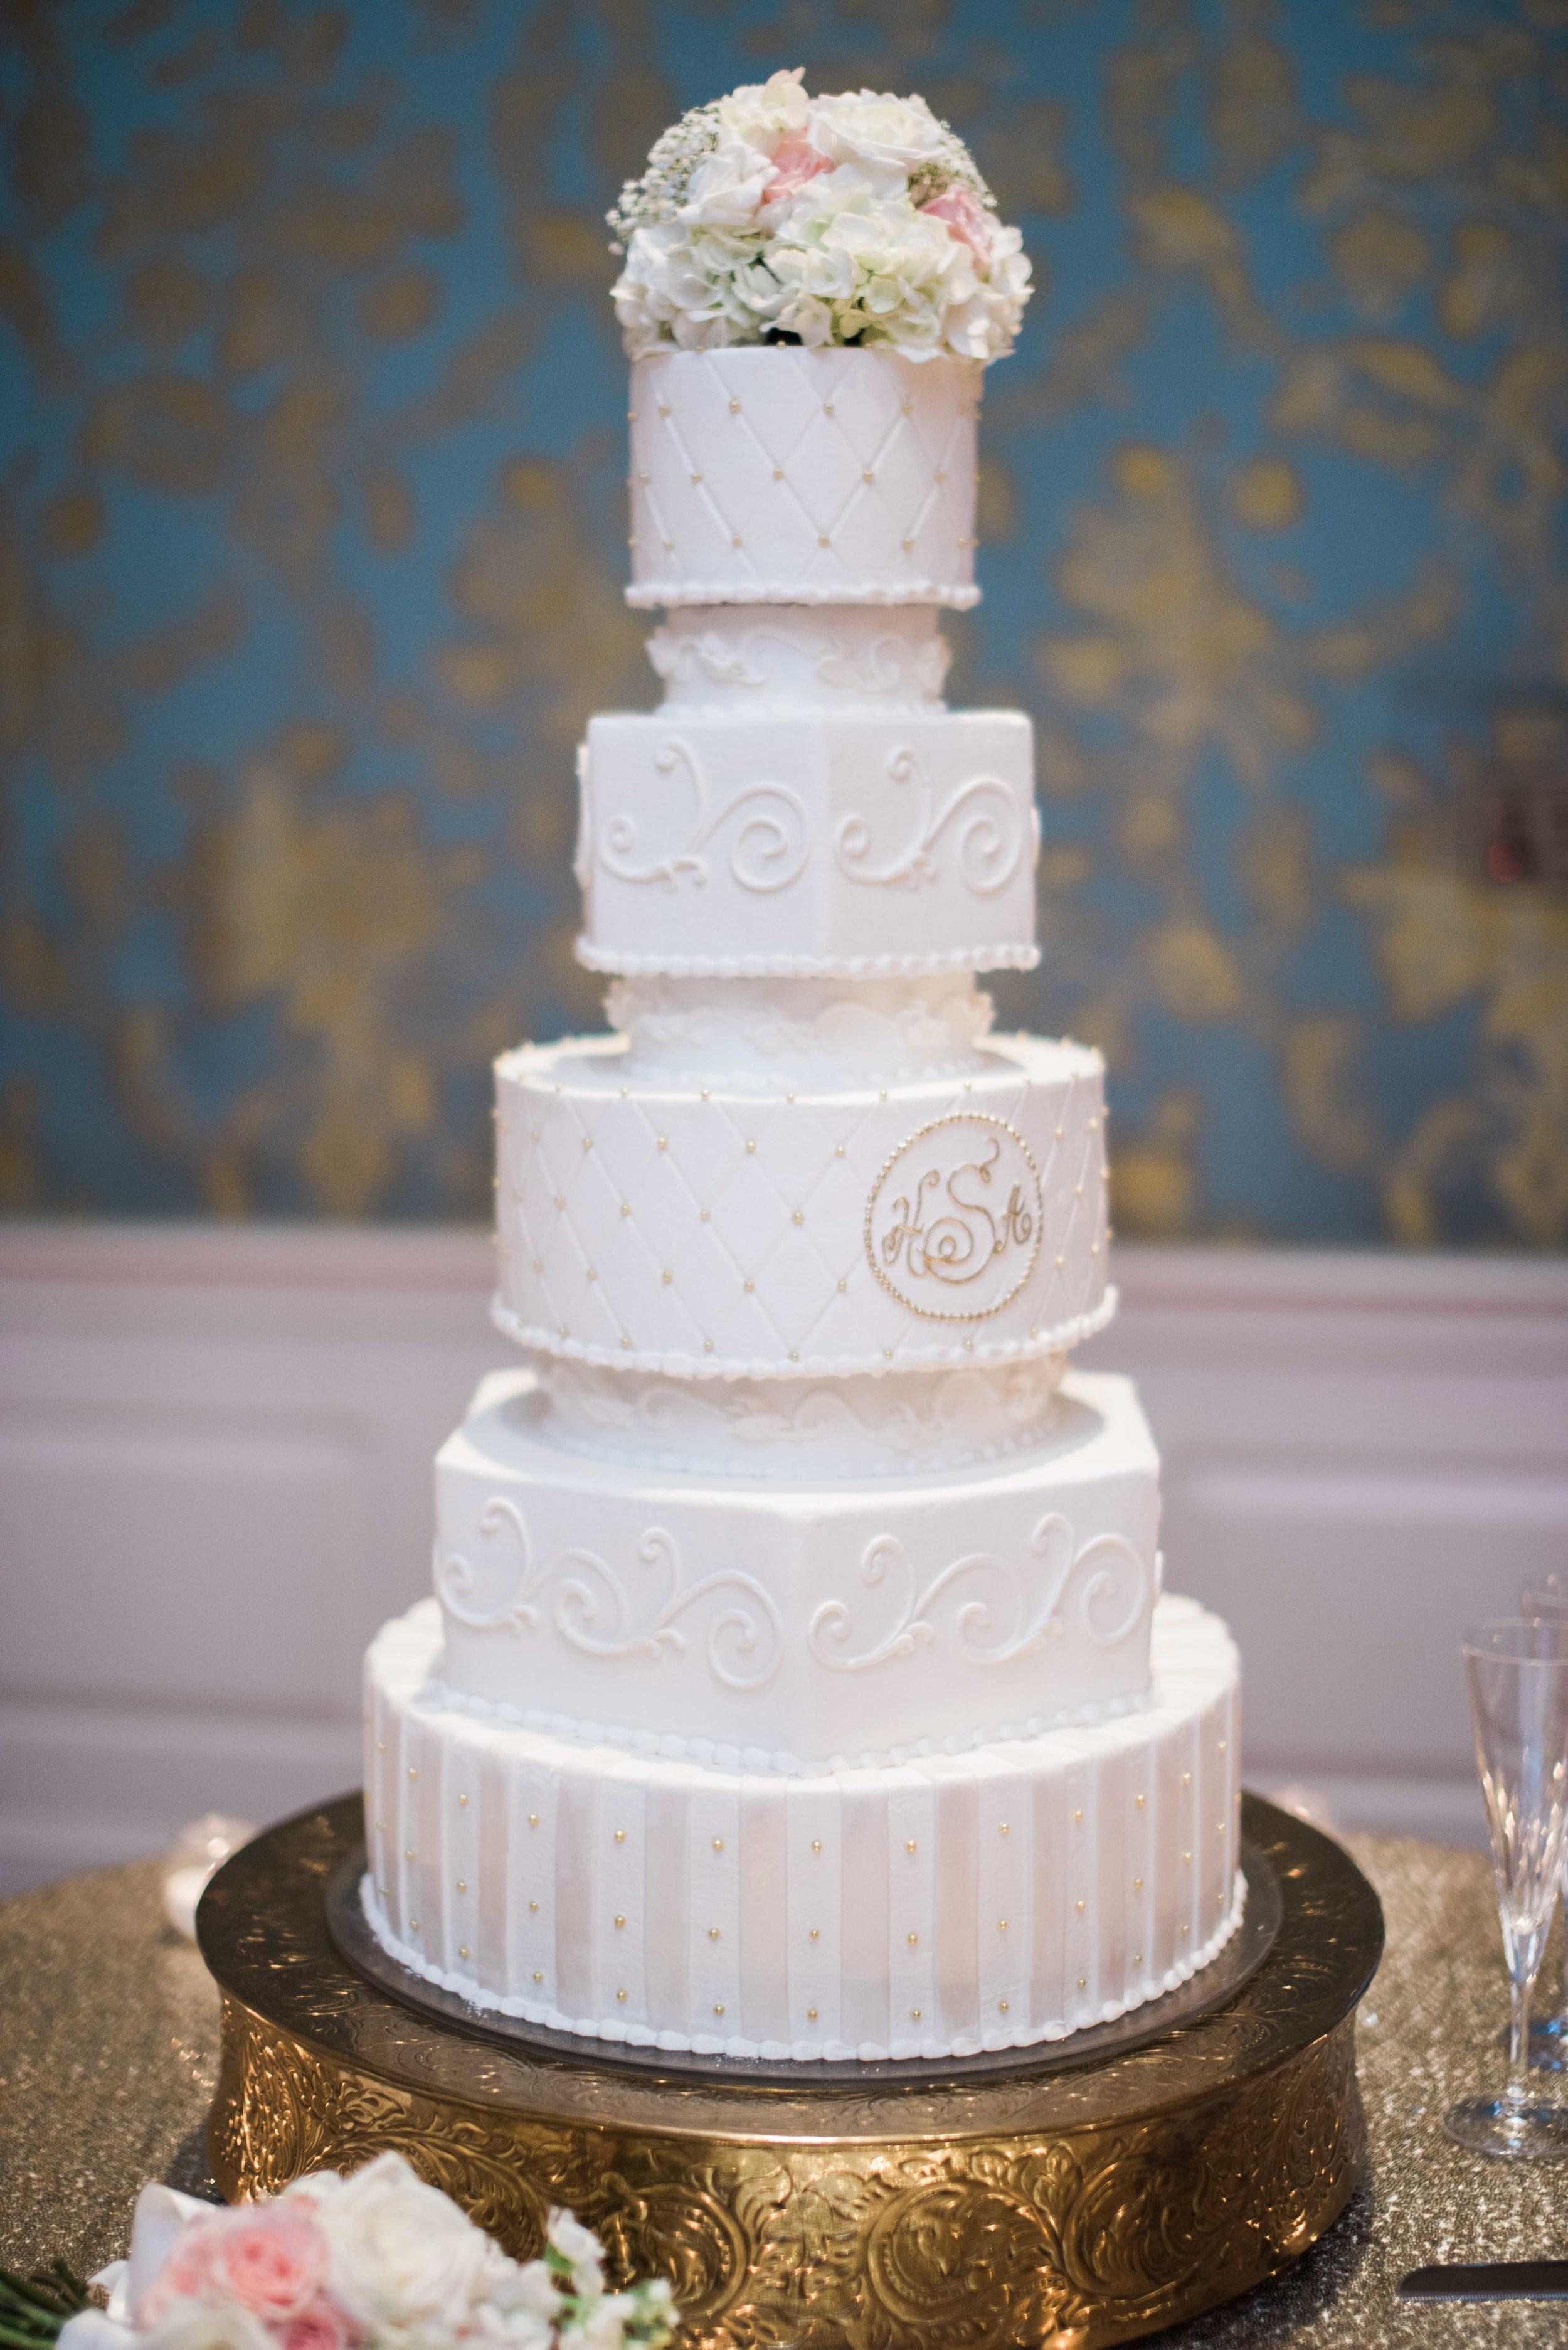 Dana-Fernandez-Photography-Weddings-in-Houston-Magazine-feature-Houston-wedding-photographer-film-39.jpg